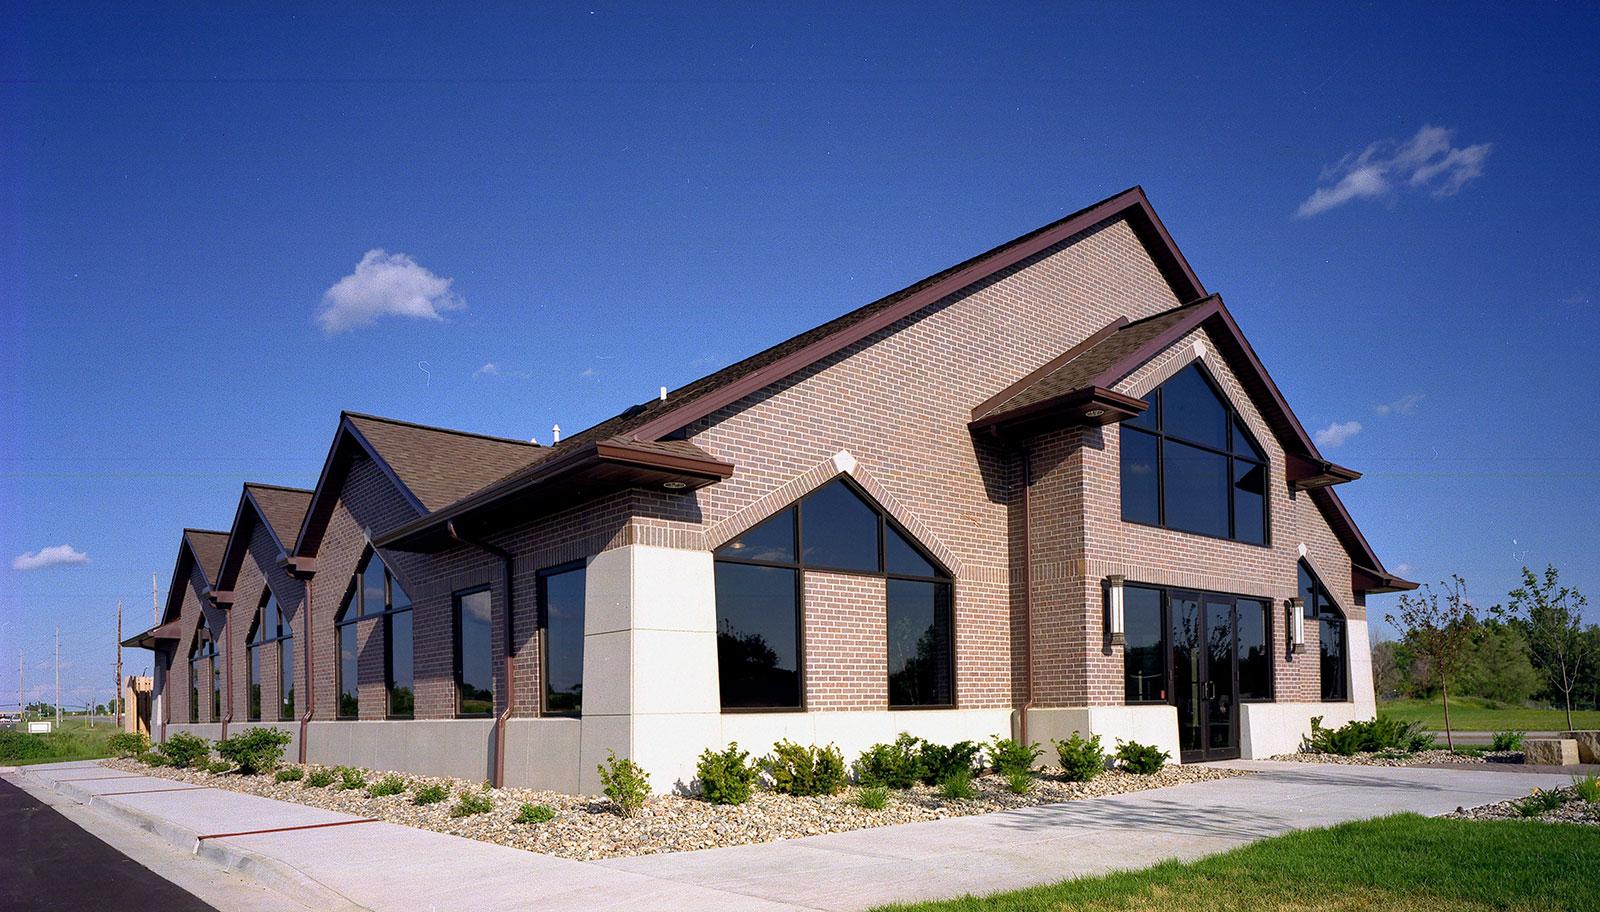 Hpc llc ames iowa general contractor commercial construction - Design homes ames iowa ...